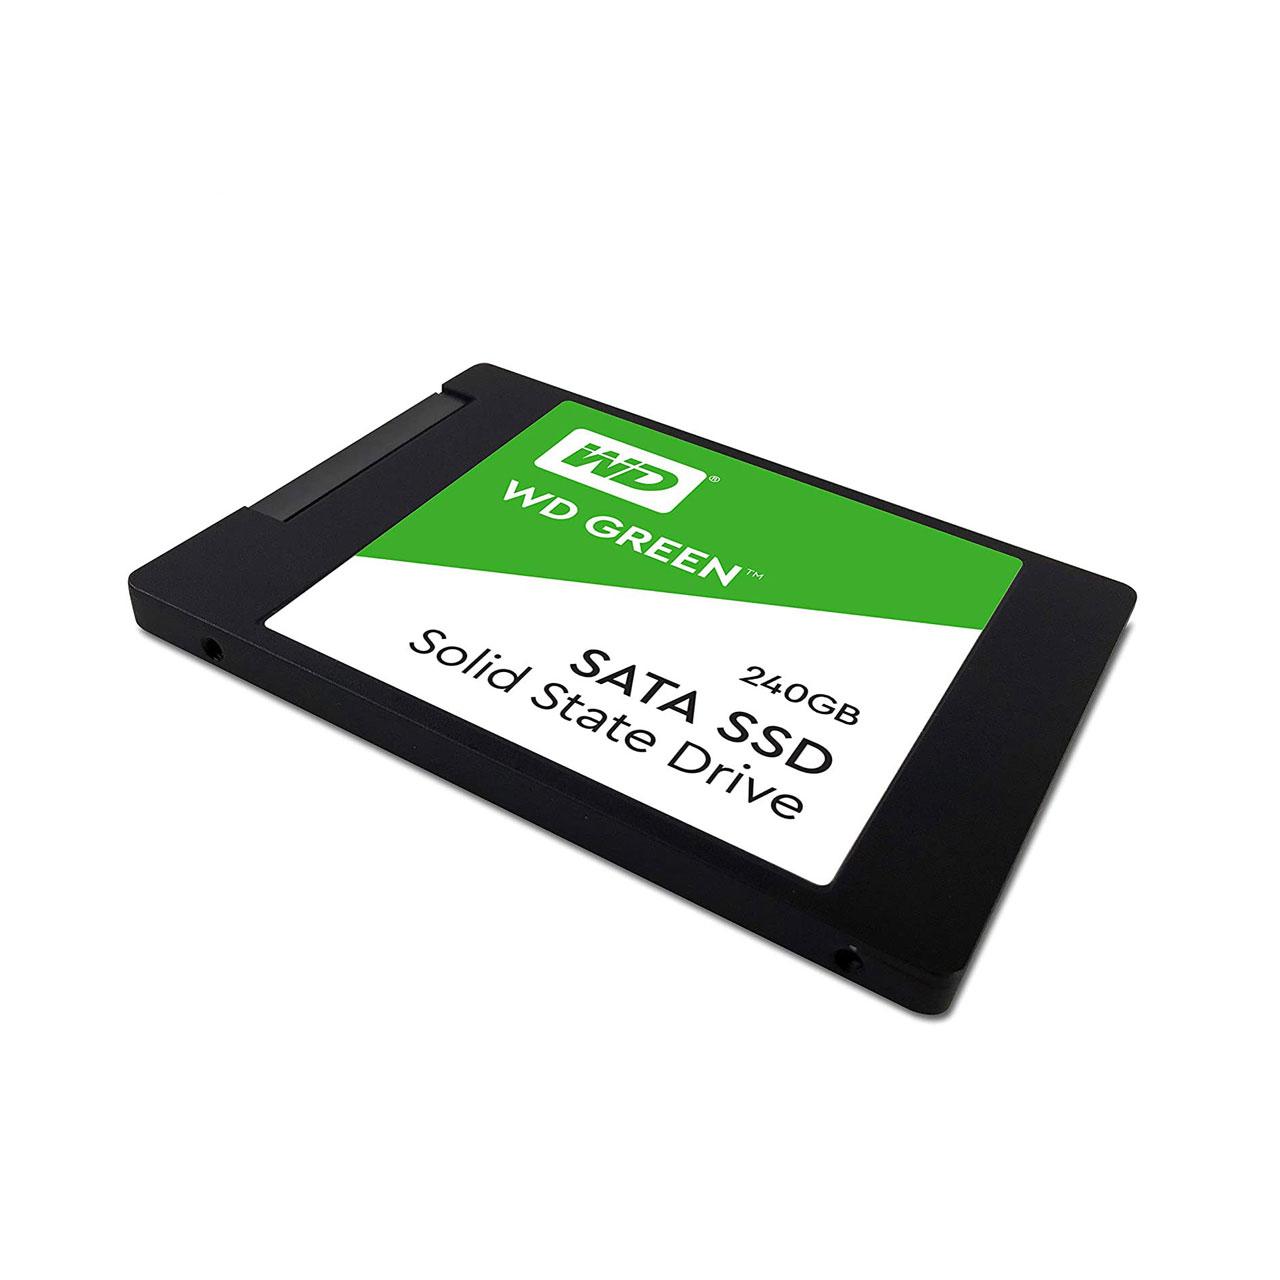 اس33-اس-دی-اینترنال-وسترن-دیجیتال-مدل-Green-WDS240G2G0A-ظرفیت-240-گیگا222بایت